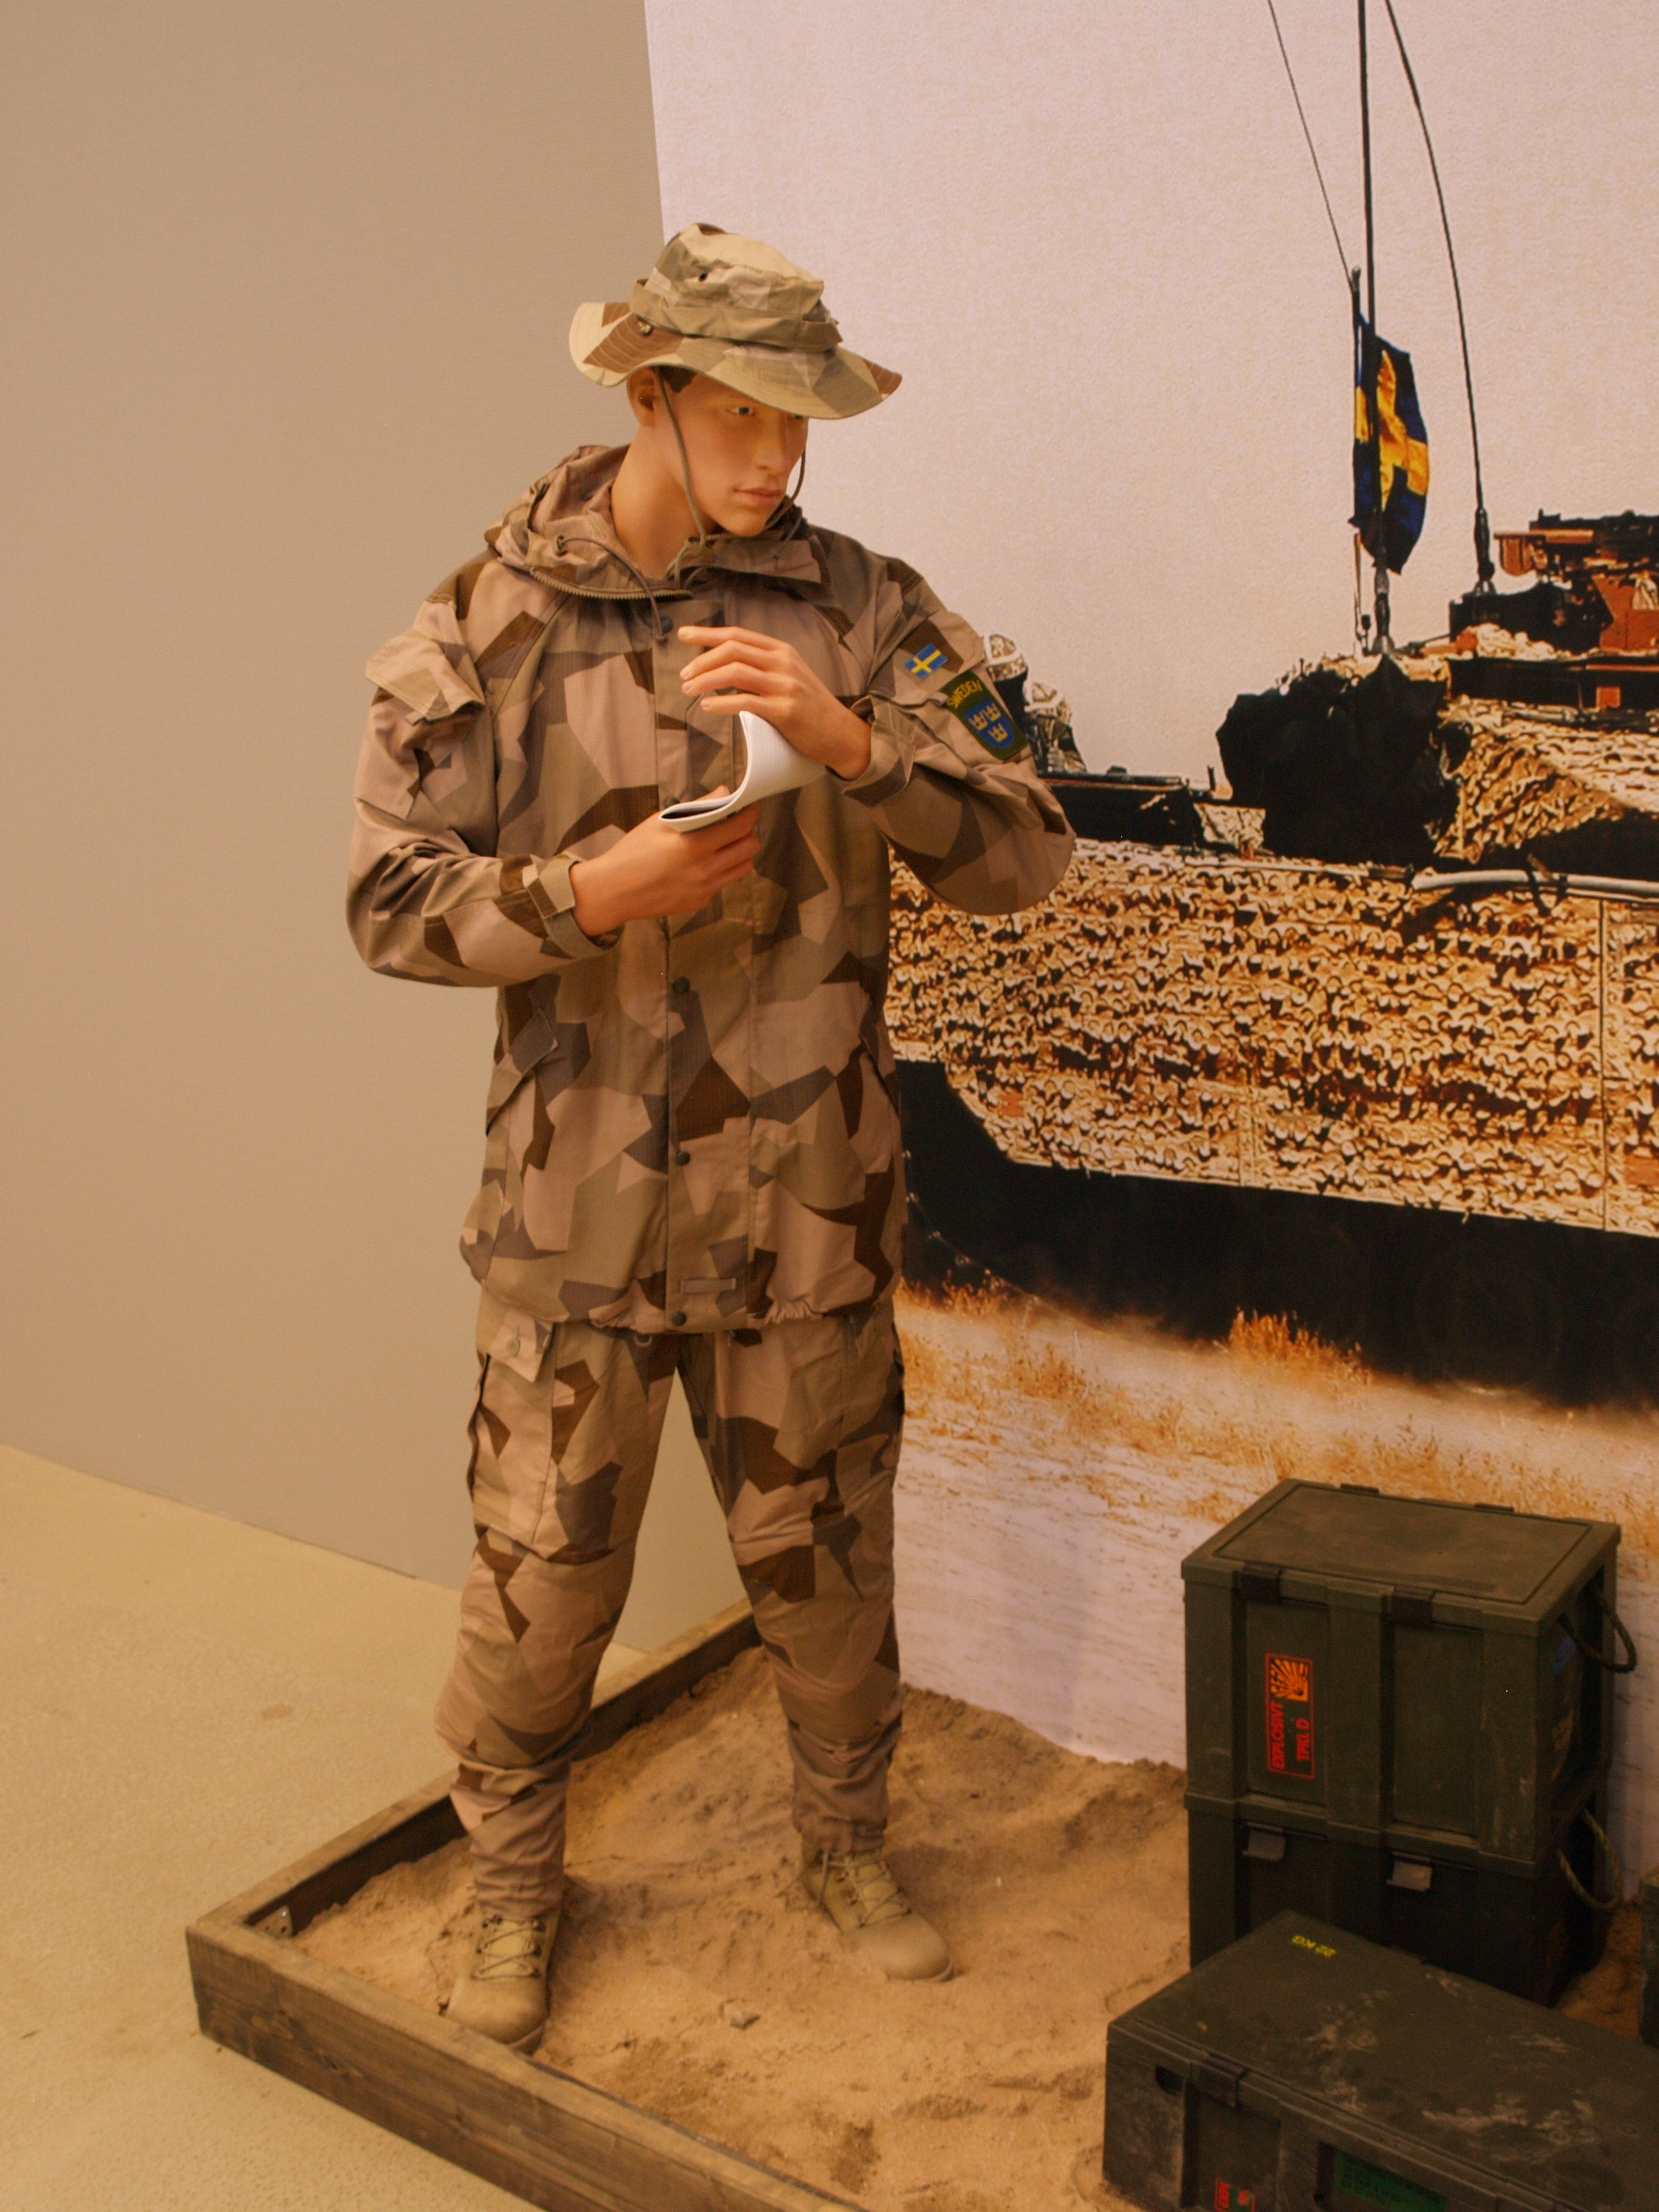 Swedish Army Camouflage En Svensk Tiger En Britt